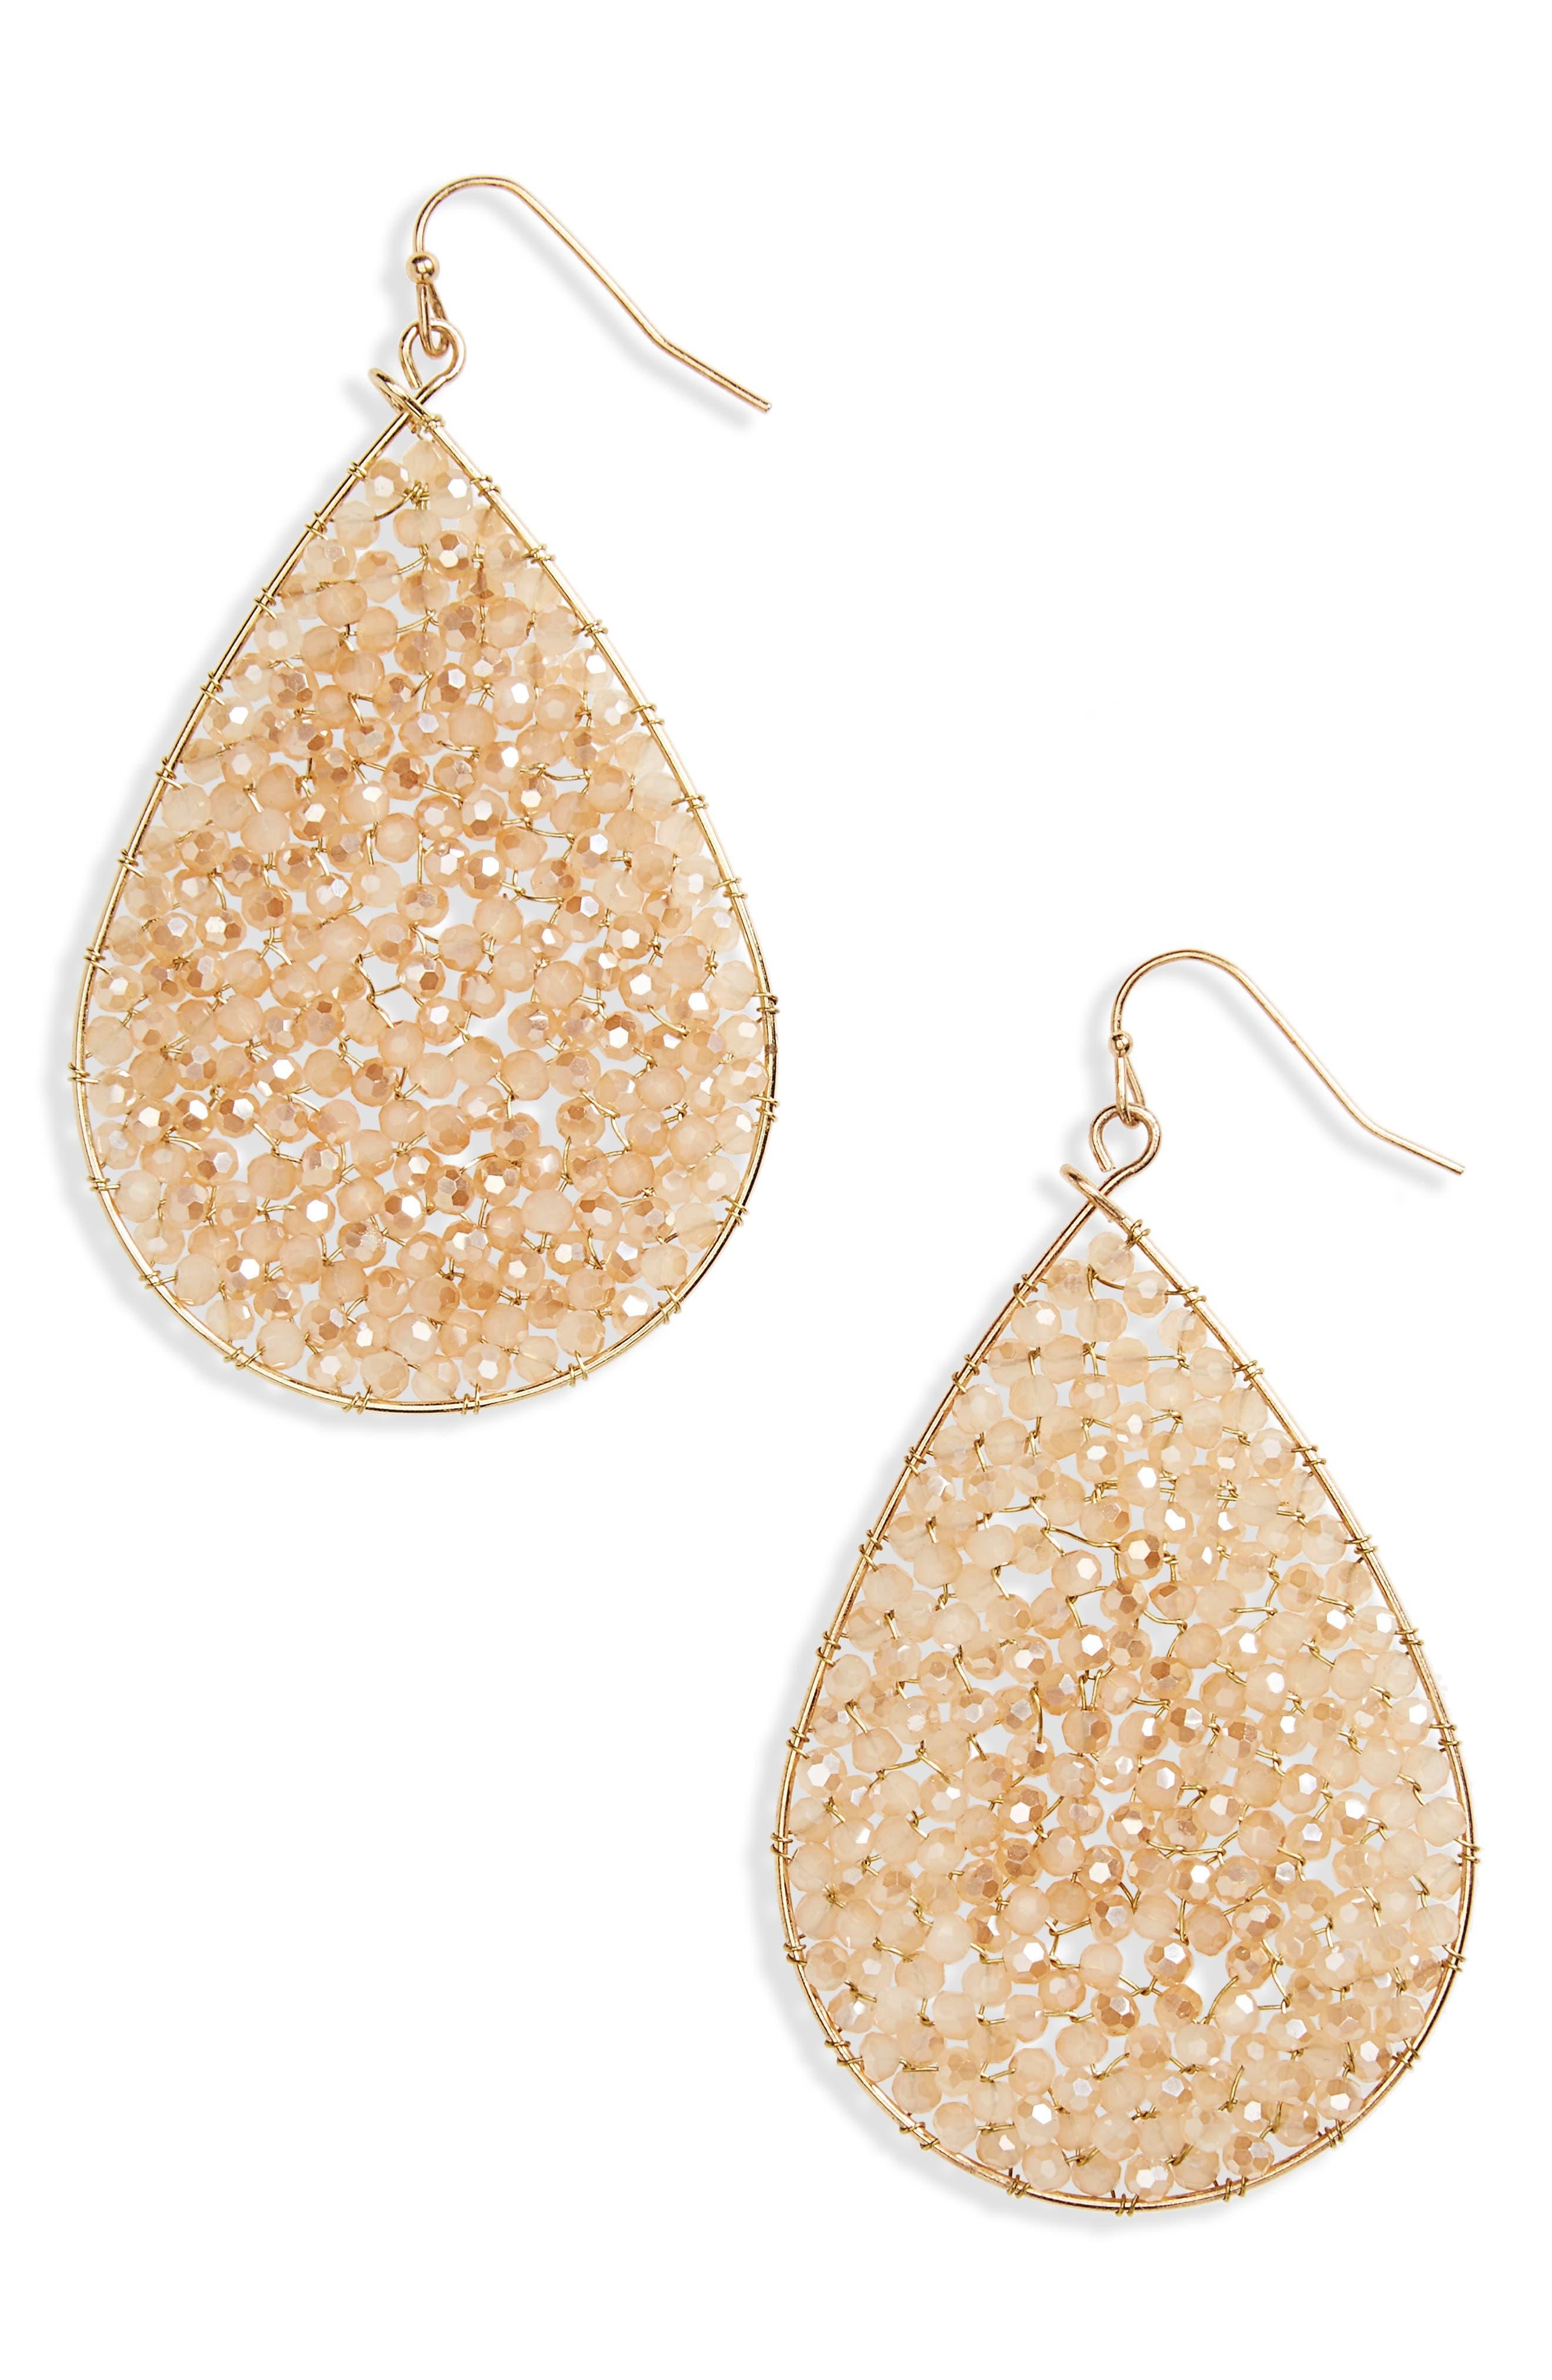 Crystal Teardrop Earrings,                             Main thumbnail 1, color,                             830